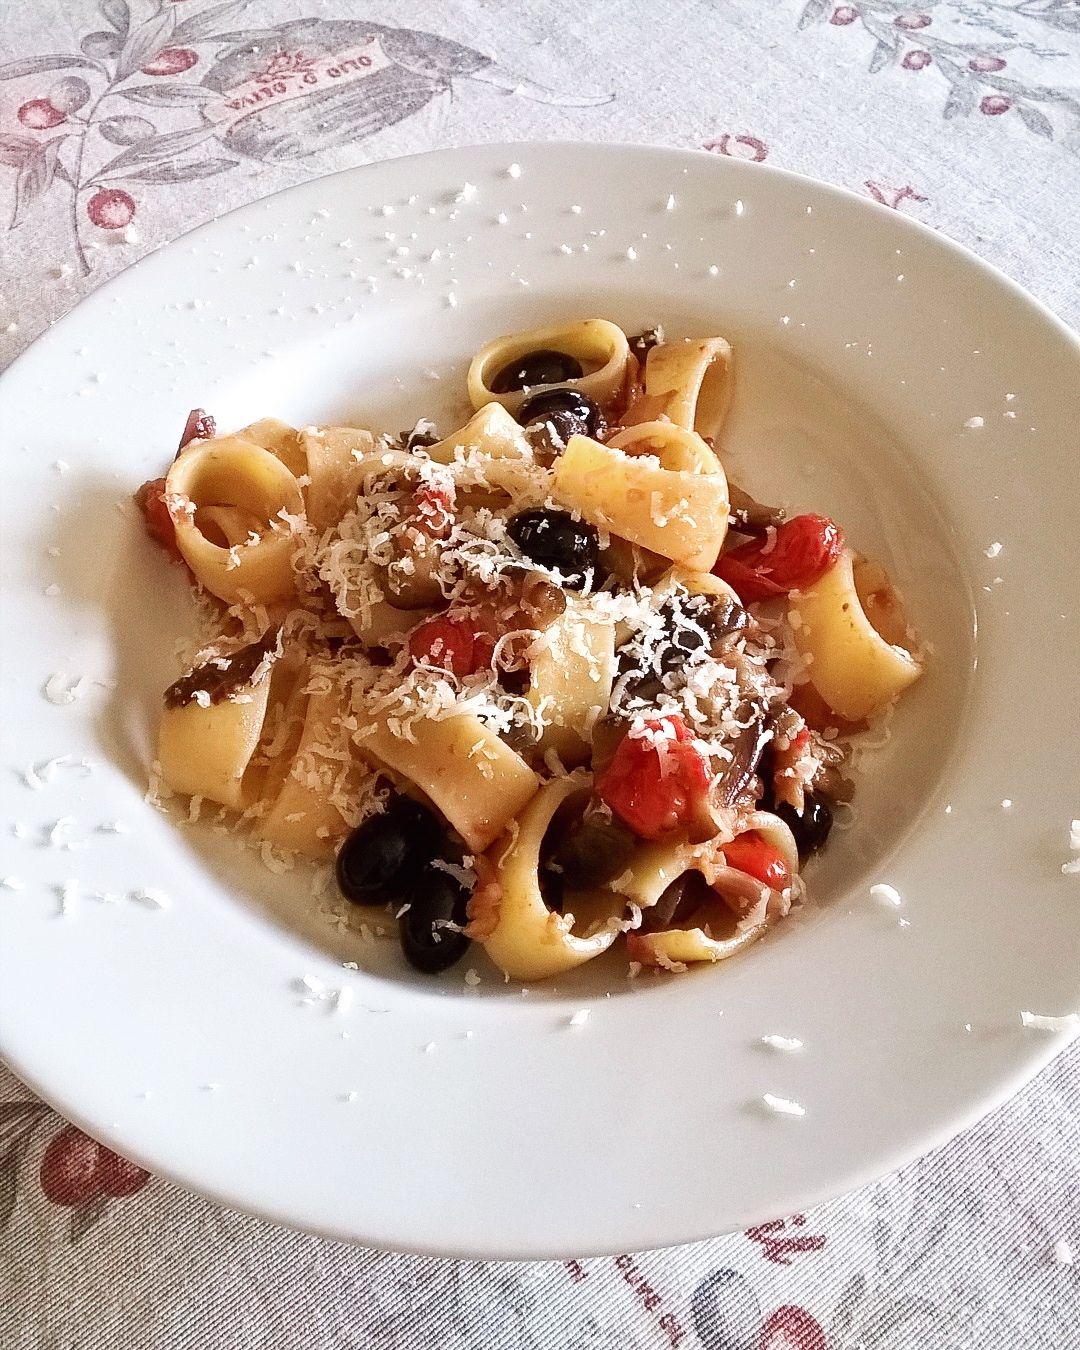 #anellini #Aubergine #tomatoes #olive #pasta #food #ilovefood #ilovecooking #ilovetocook #foodlove #foodlovers #foodpic #eat #cooking #recipe #delish #delicious #tasty #yummy #foodheaven #foodgasm #foodpornography #foodporn #IgersAbruzzo #igersmilano #italia #italy #nick83i